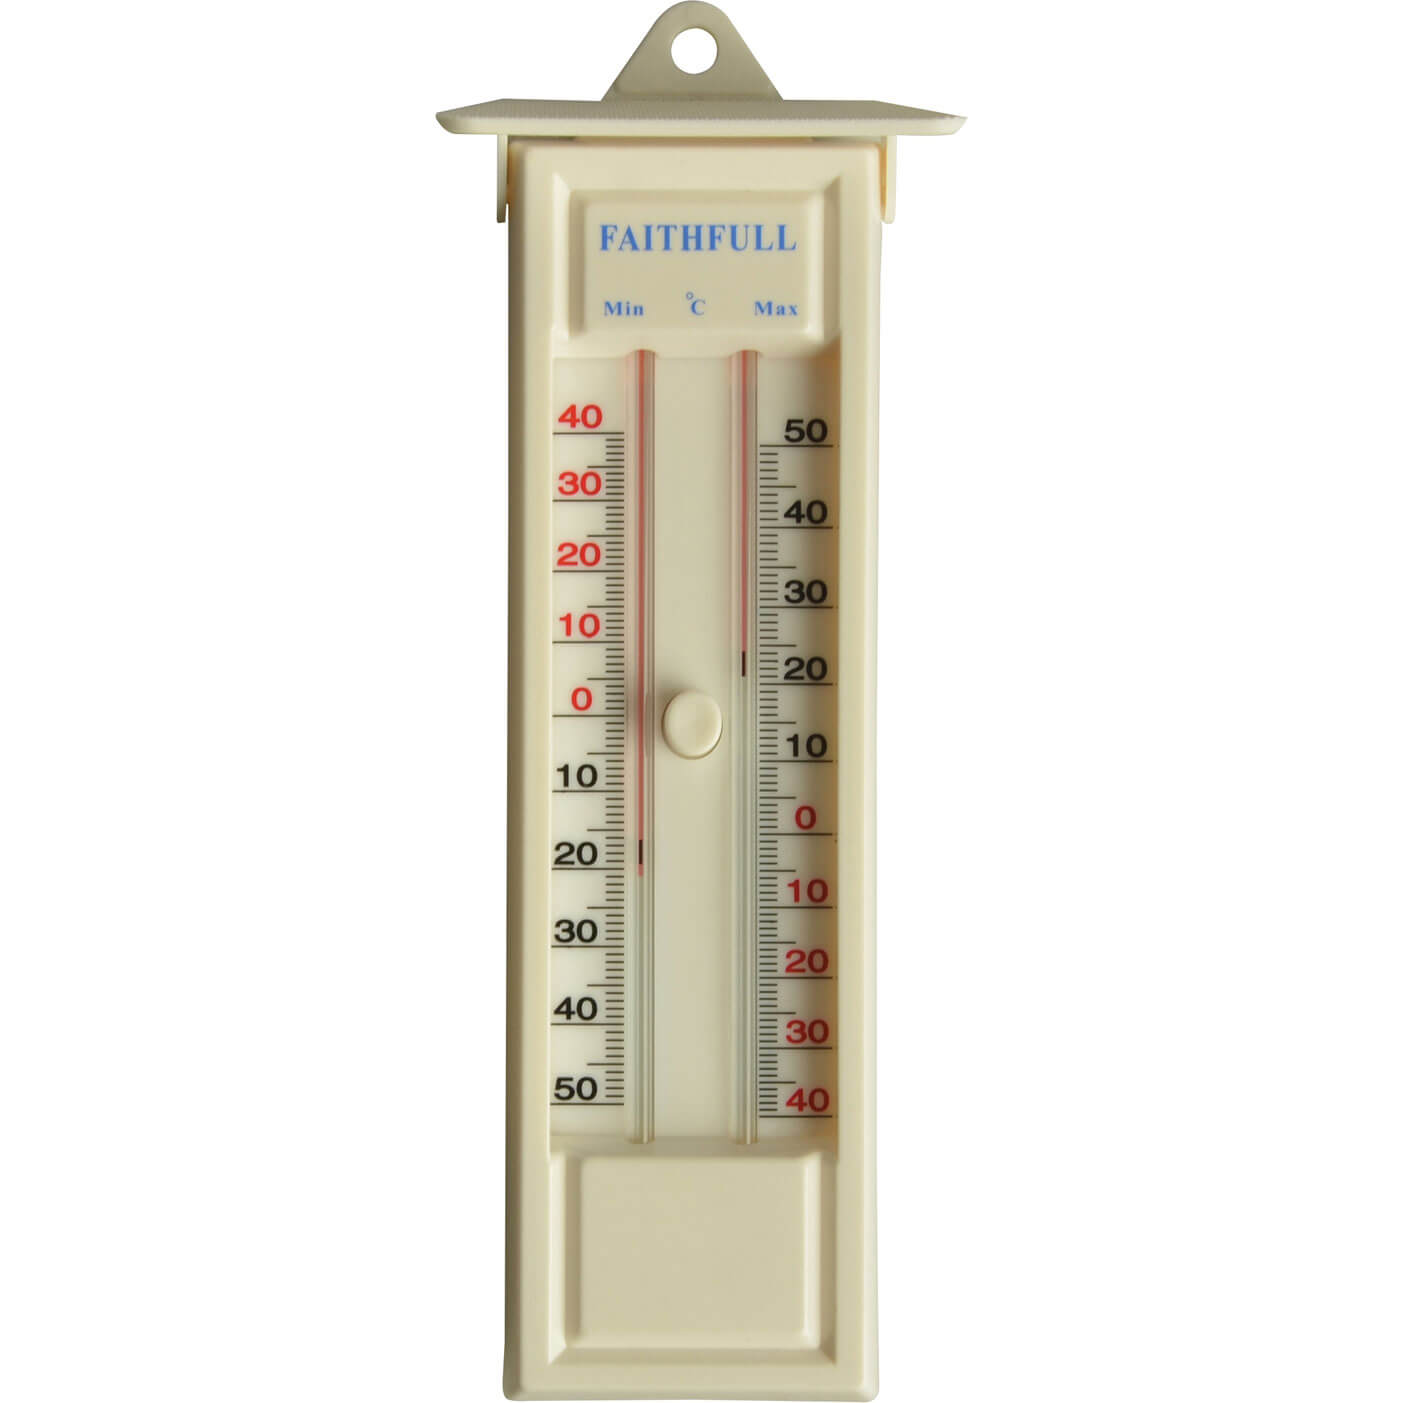 faithfull maximum minimum thermometer. Black Bedroom Furniture Sets. Home Design Ideas